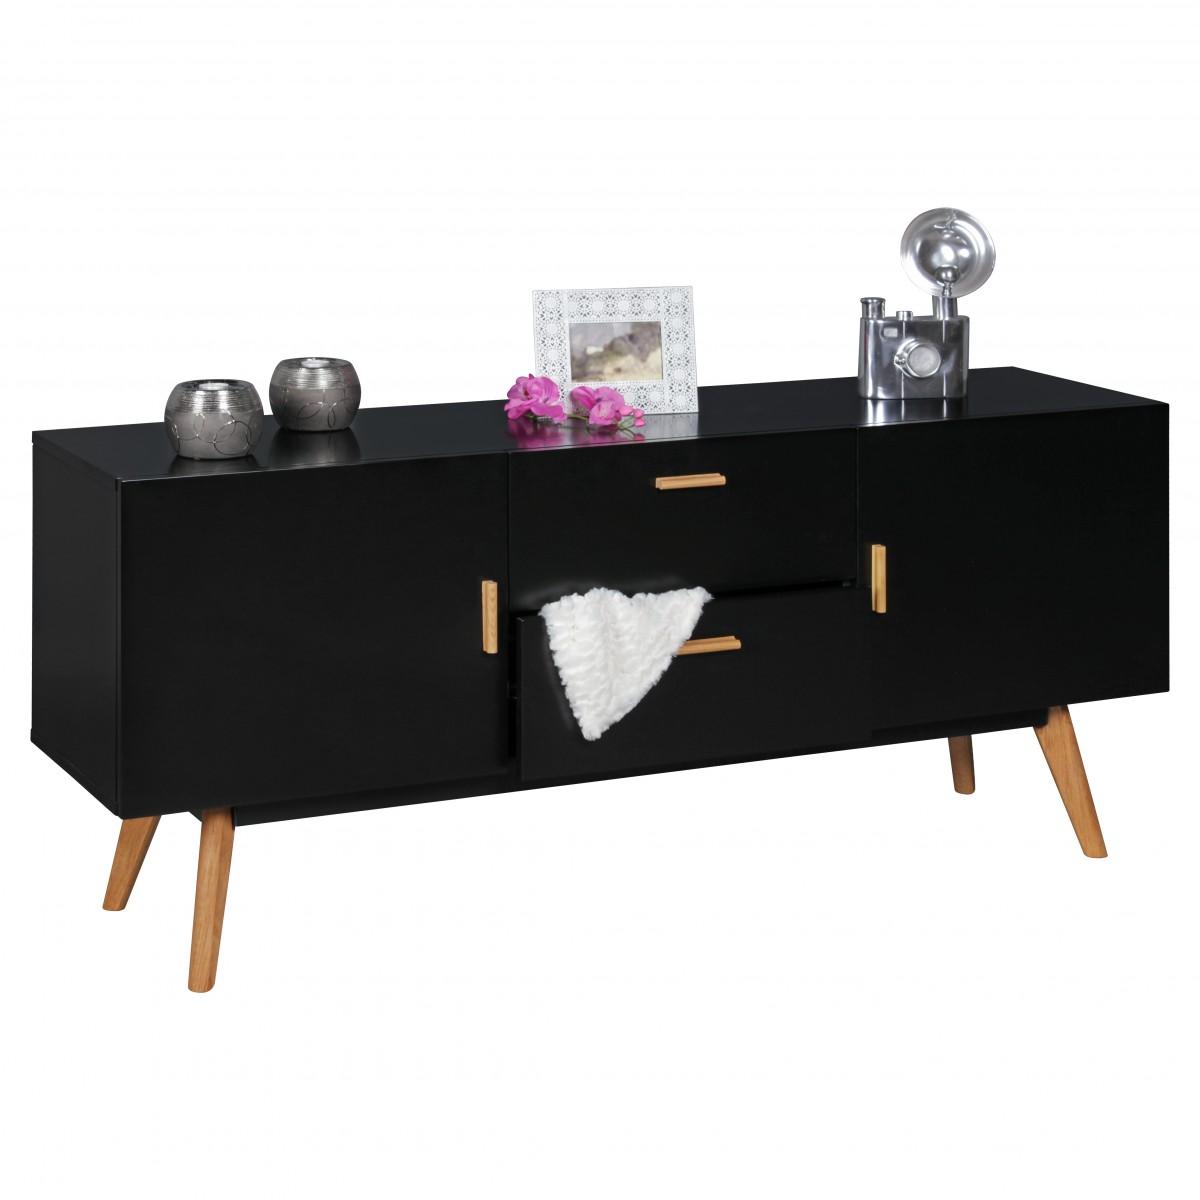 wohnling retro sideboard scanio mdf holz schwarz 2. Black Bedroom Furniture Sets. Home Design Ideas